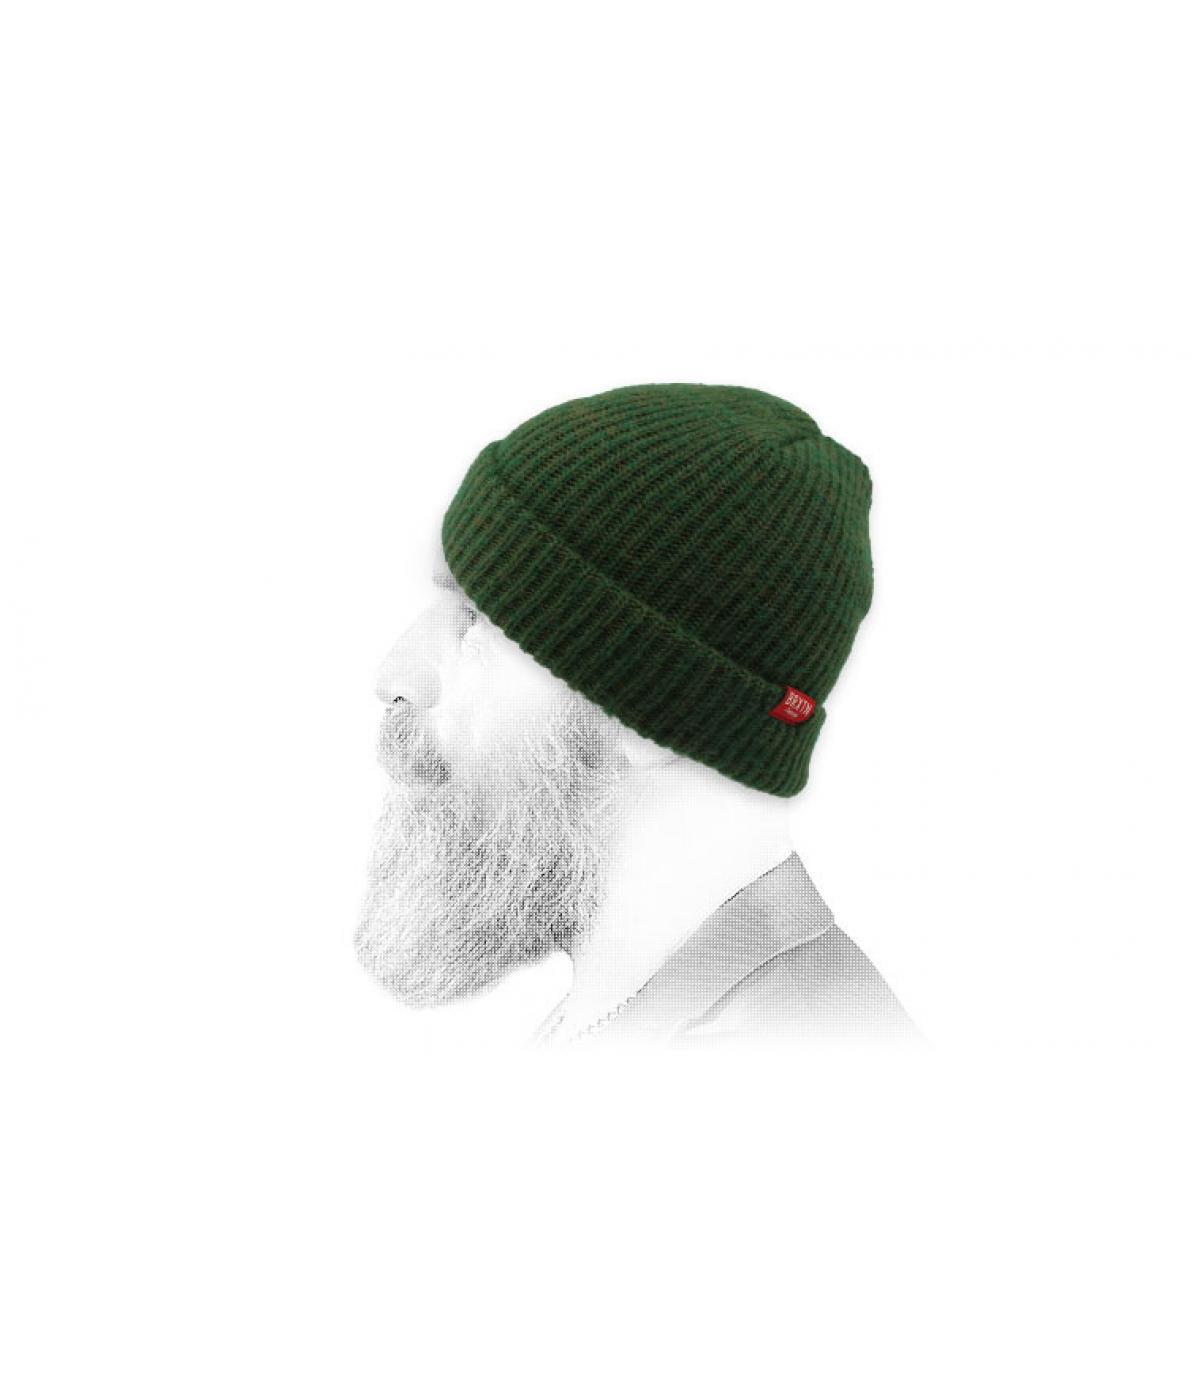 Brixton cappello verde scuro